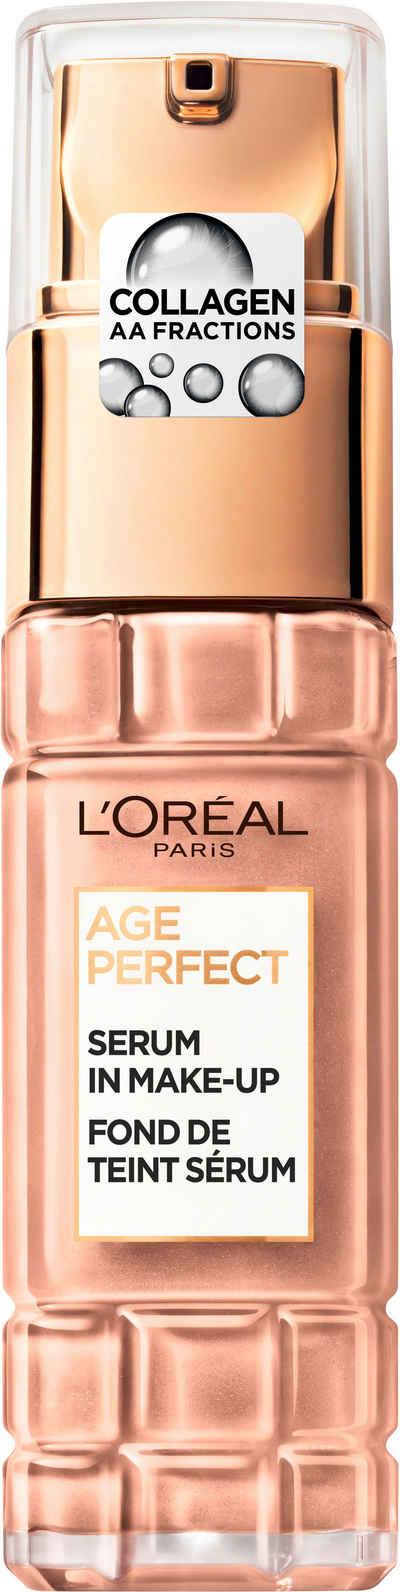 L'ORÉAL PARIS Make-up »Age Perfect Serum in Make-up«